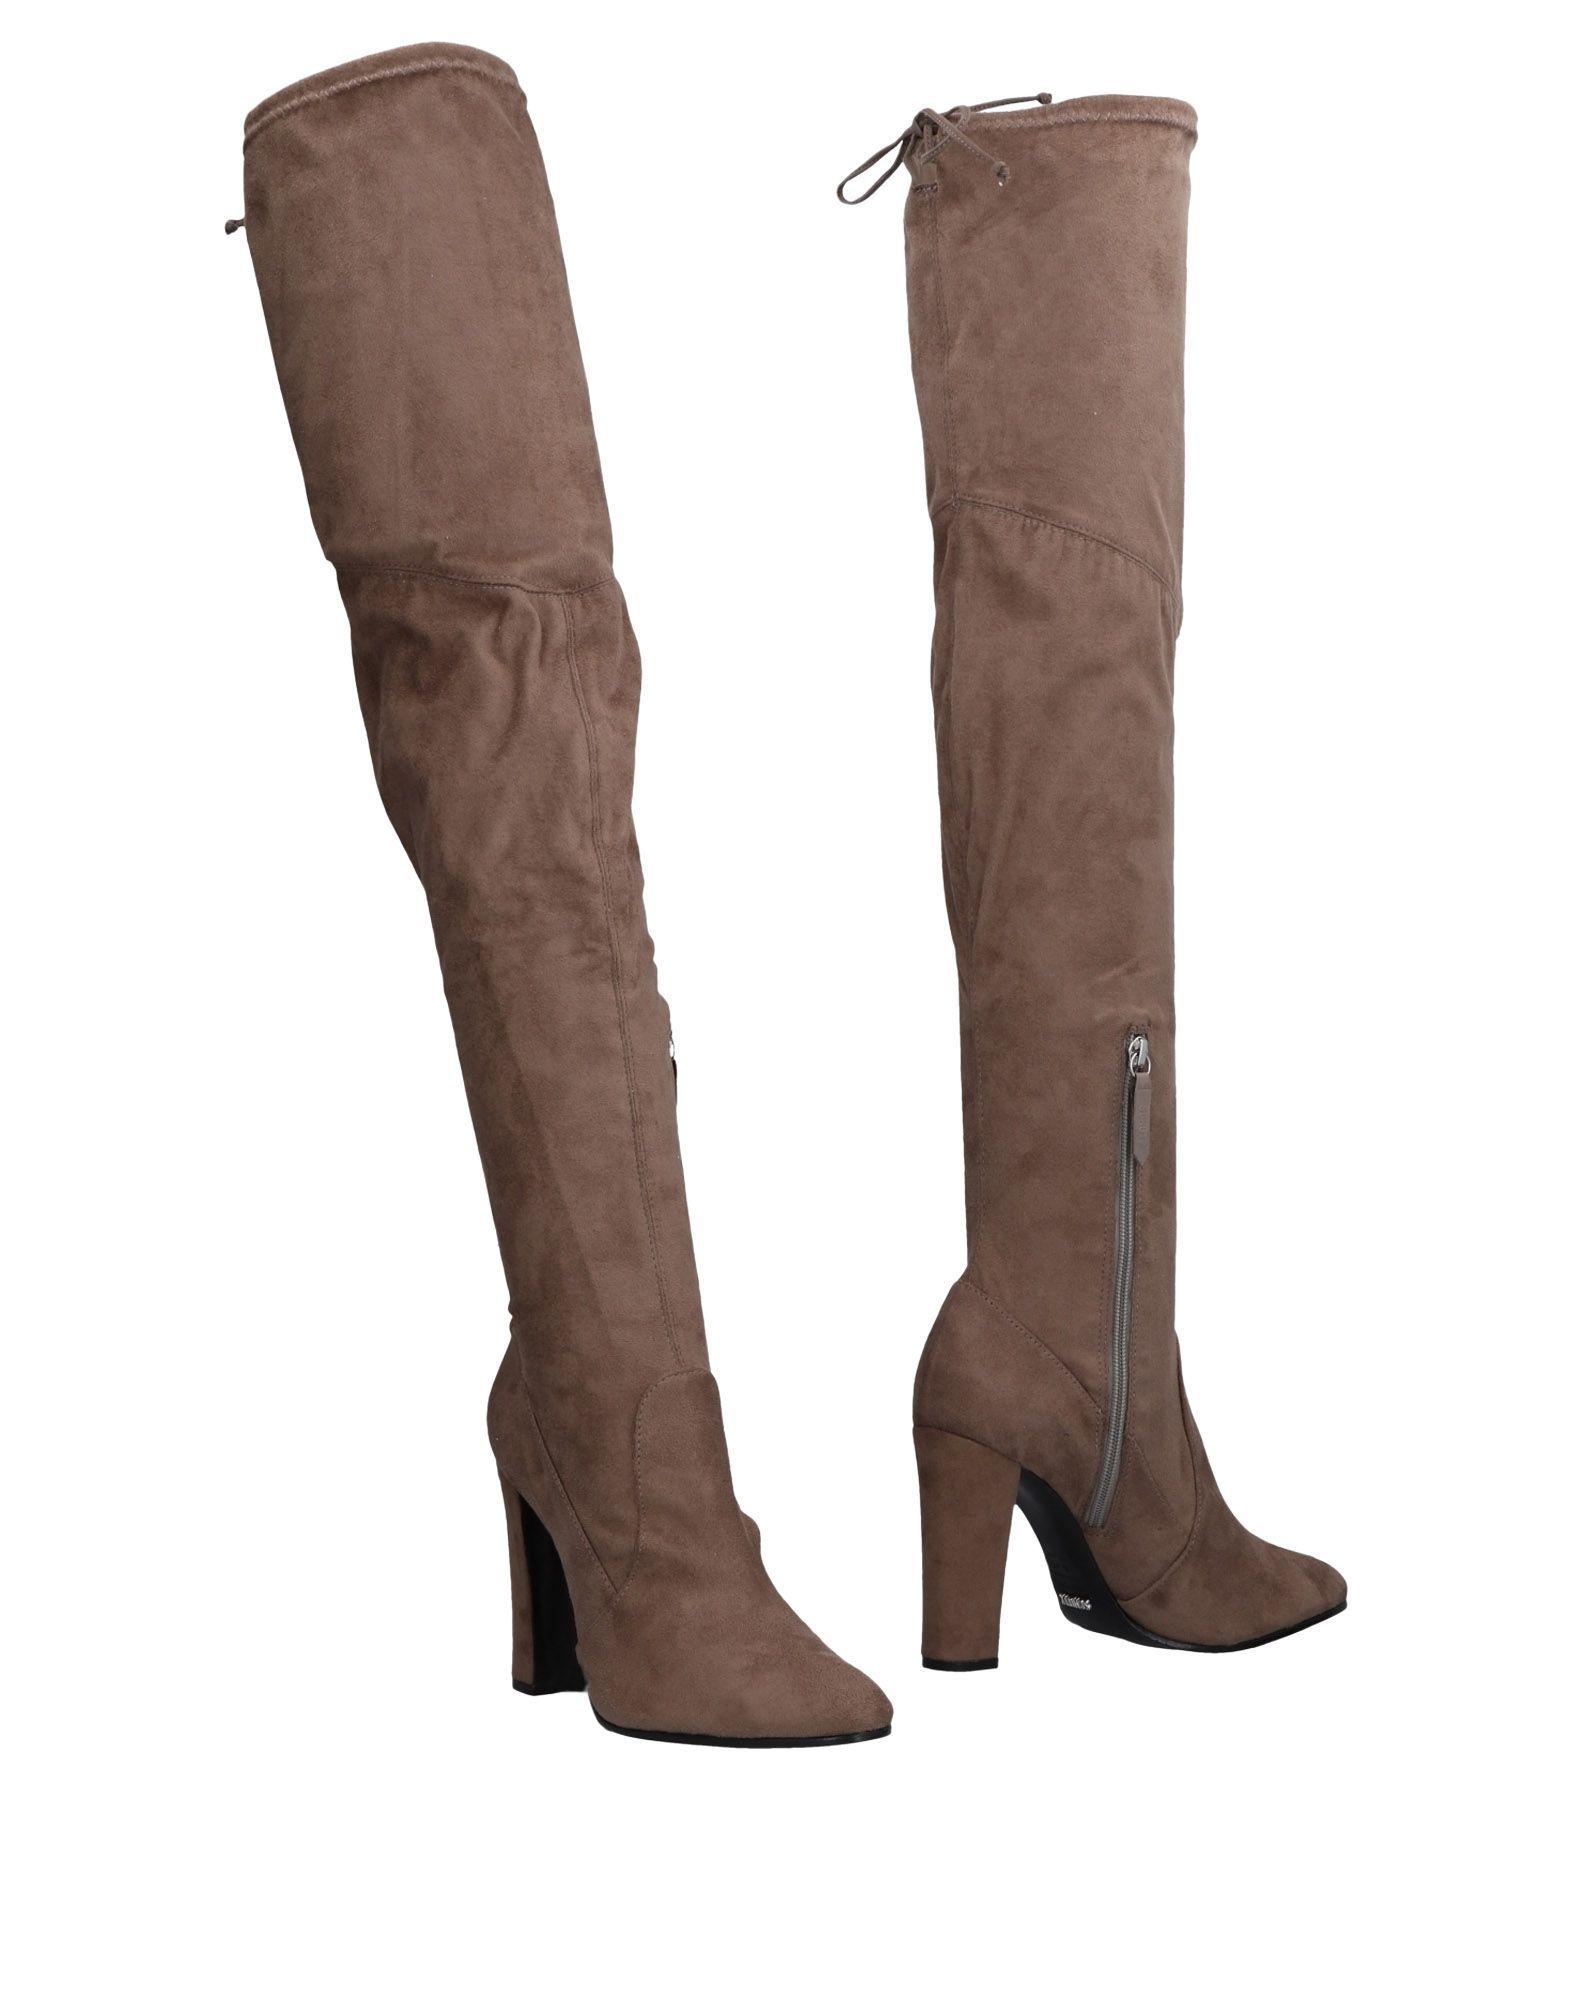 Schutz Khaki Leather Over The Knee Boots